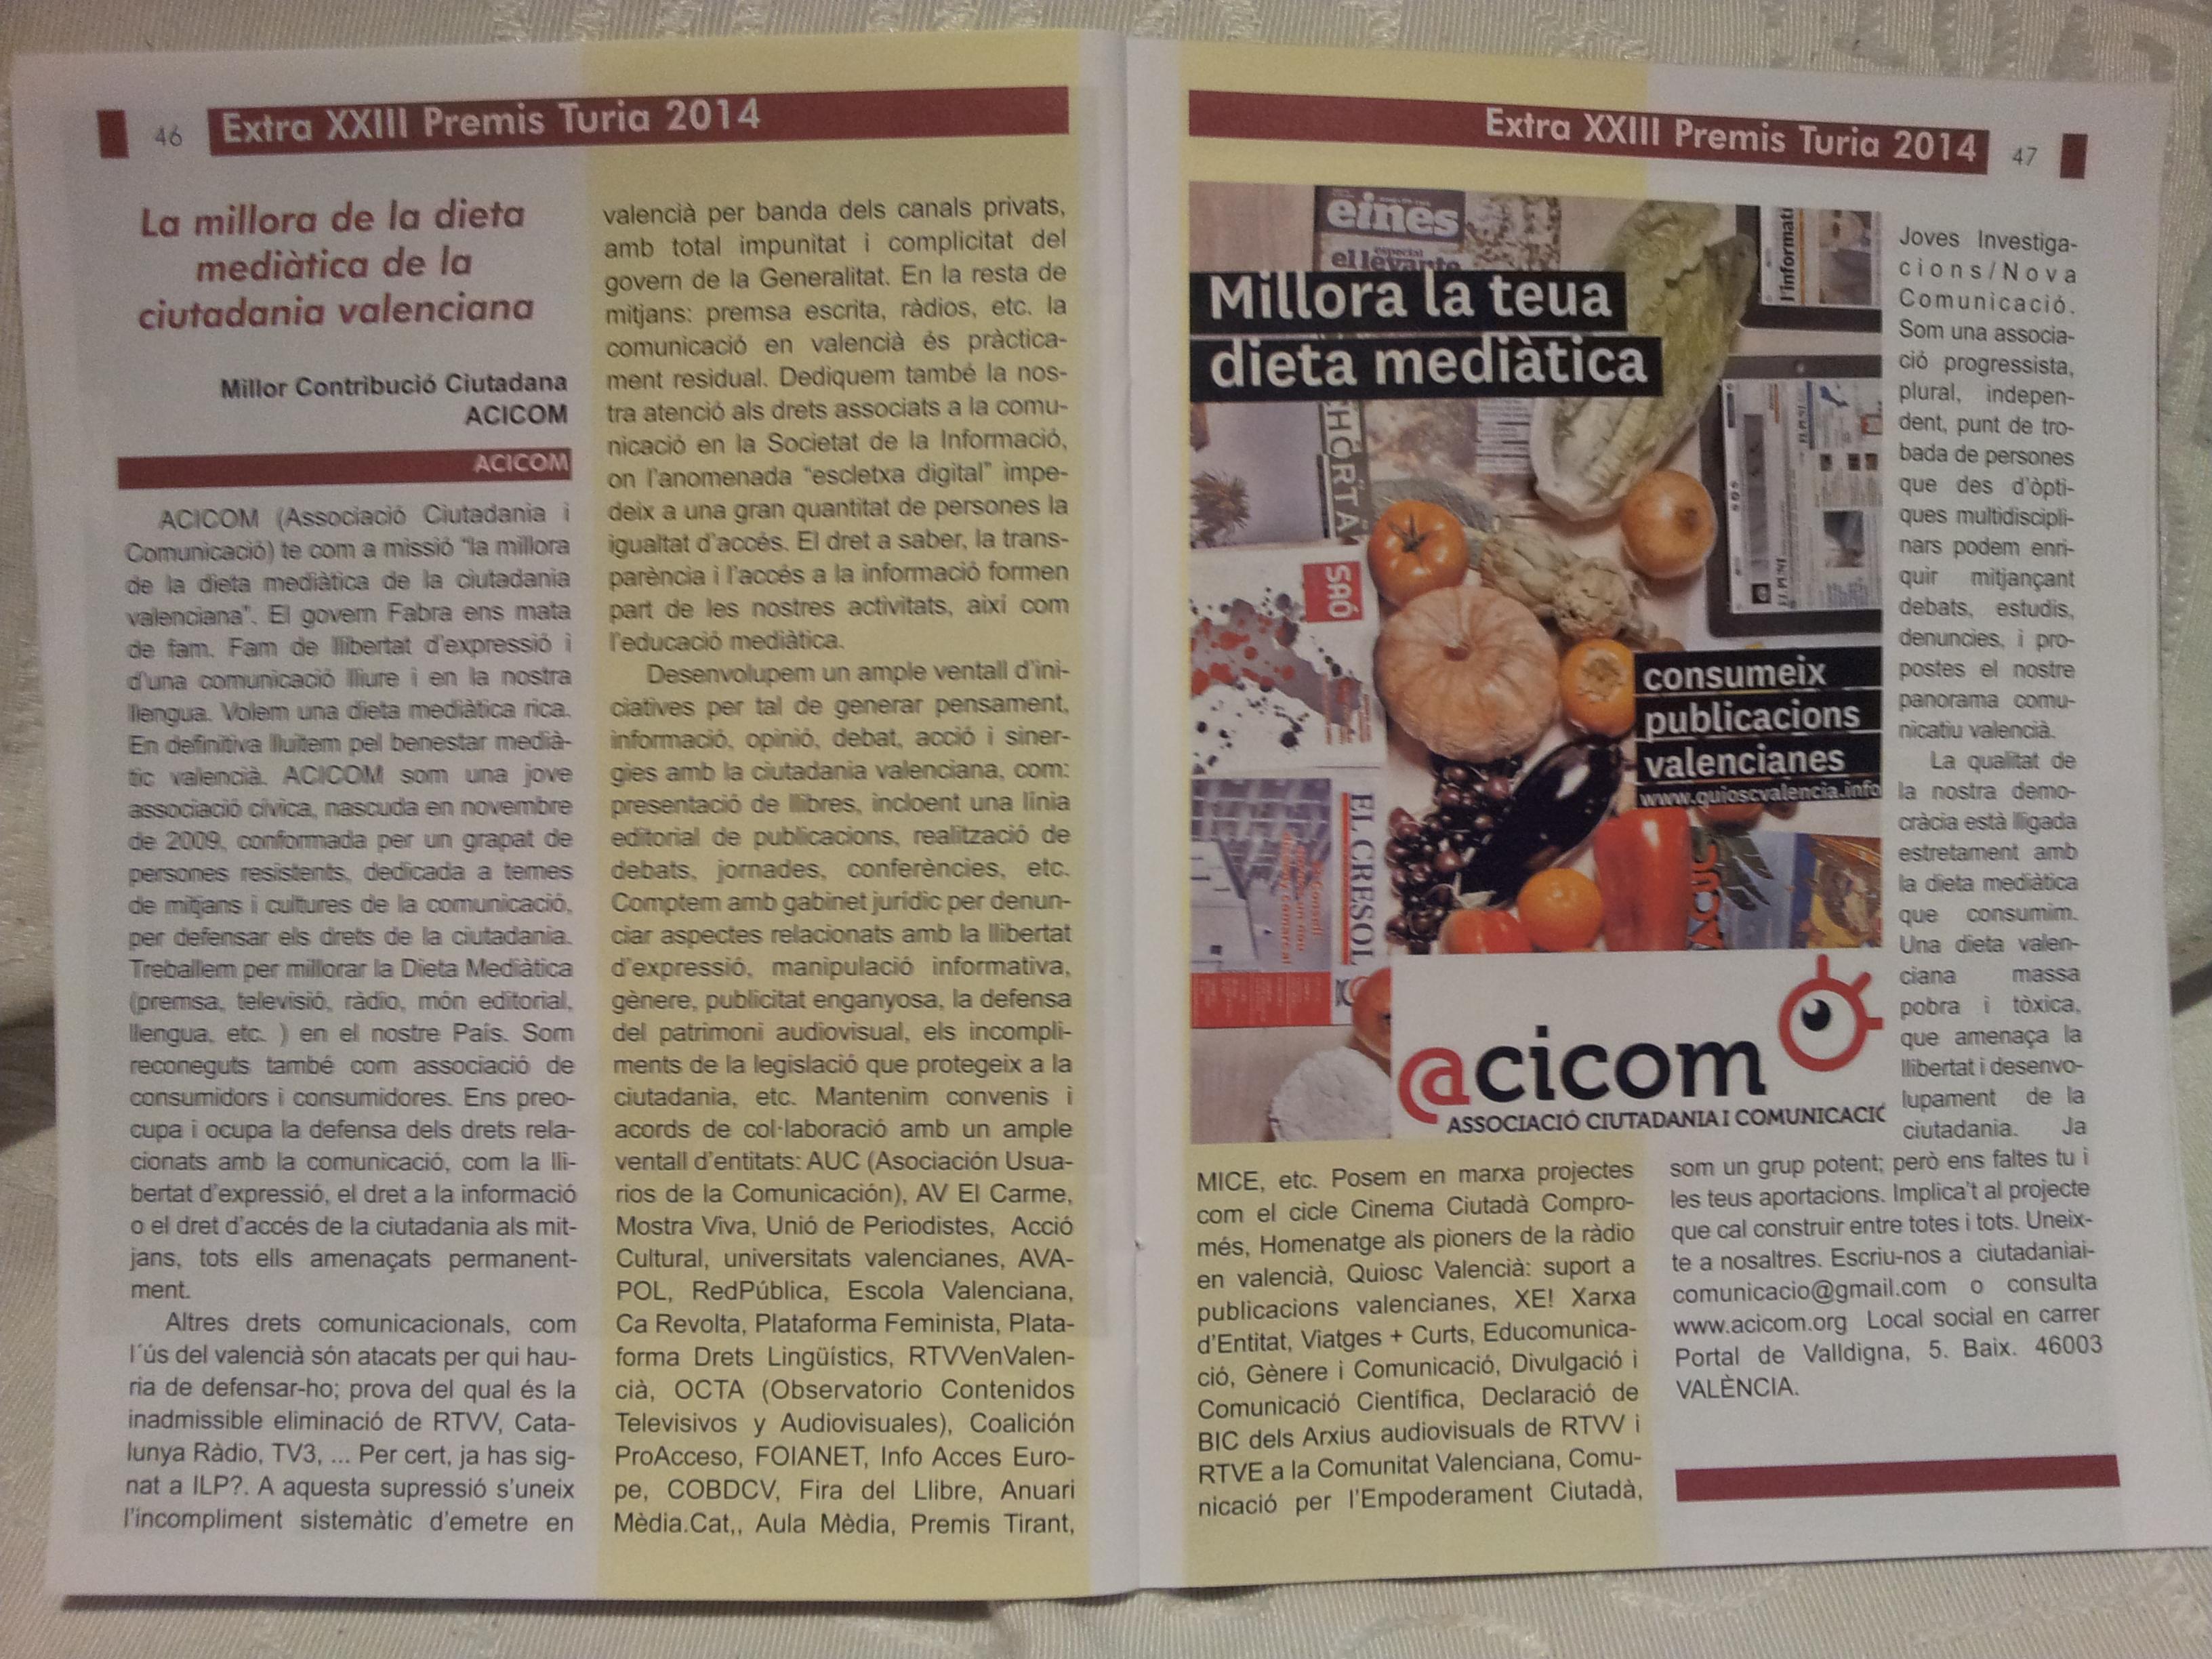 Article en Extra XXIII Premis Turia 2014